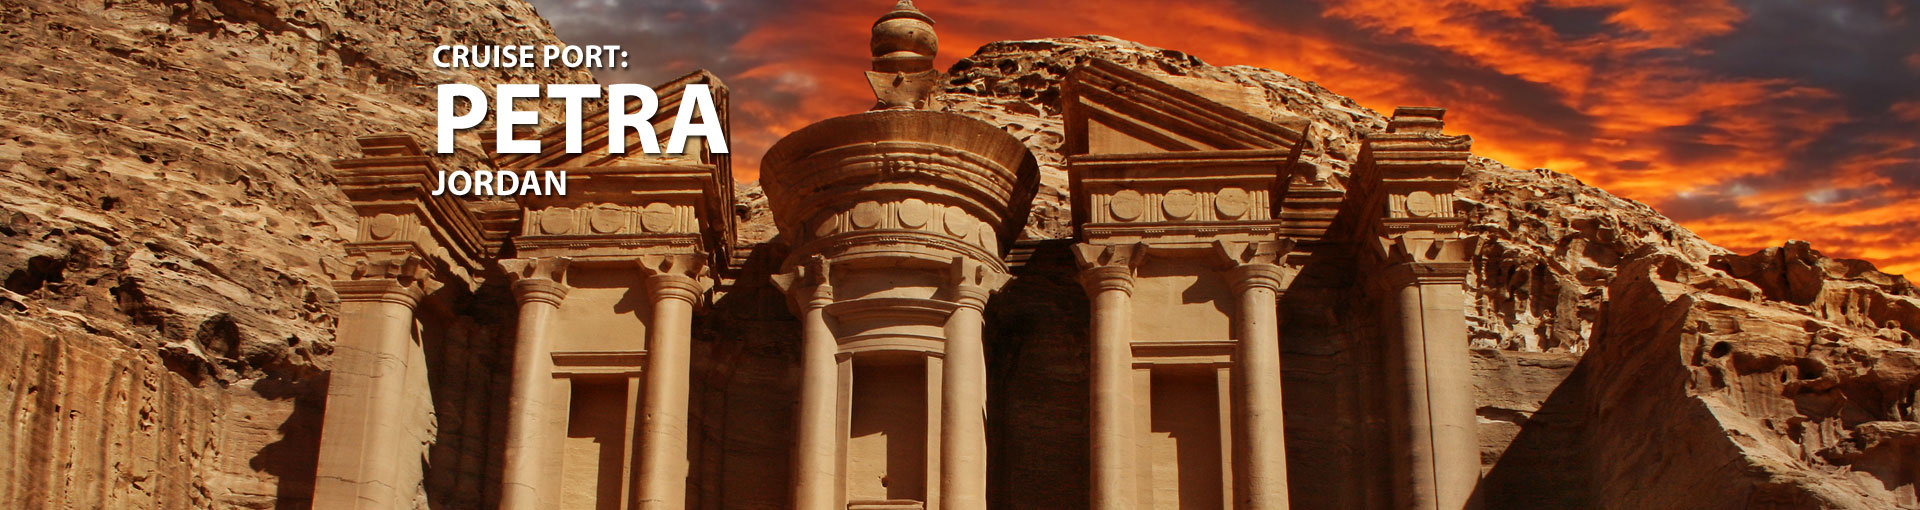 Cruises to Petra, Jordan